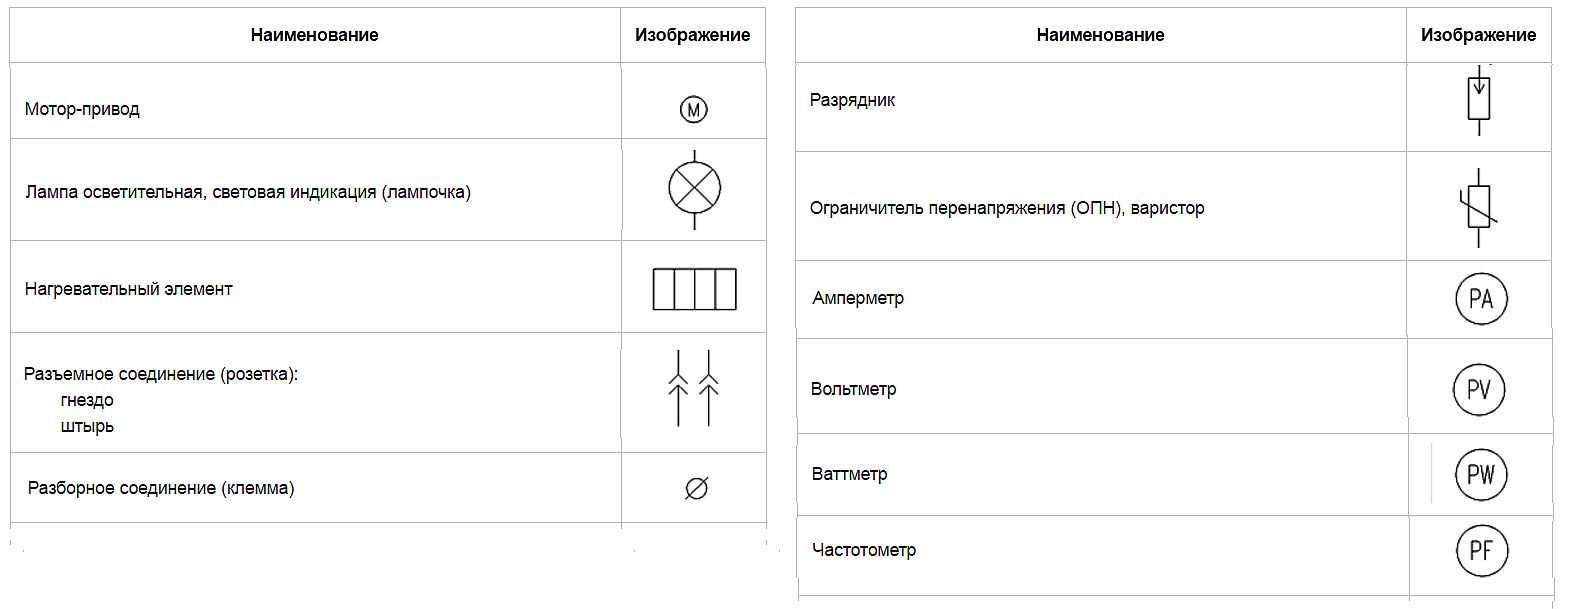 Gnd на схеме что означает. в обозначениях электрических схем что обозначает gnd и acc